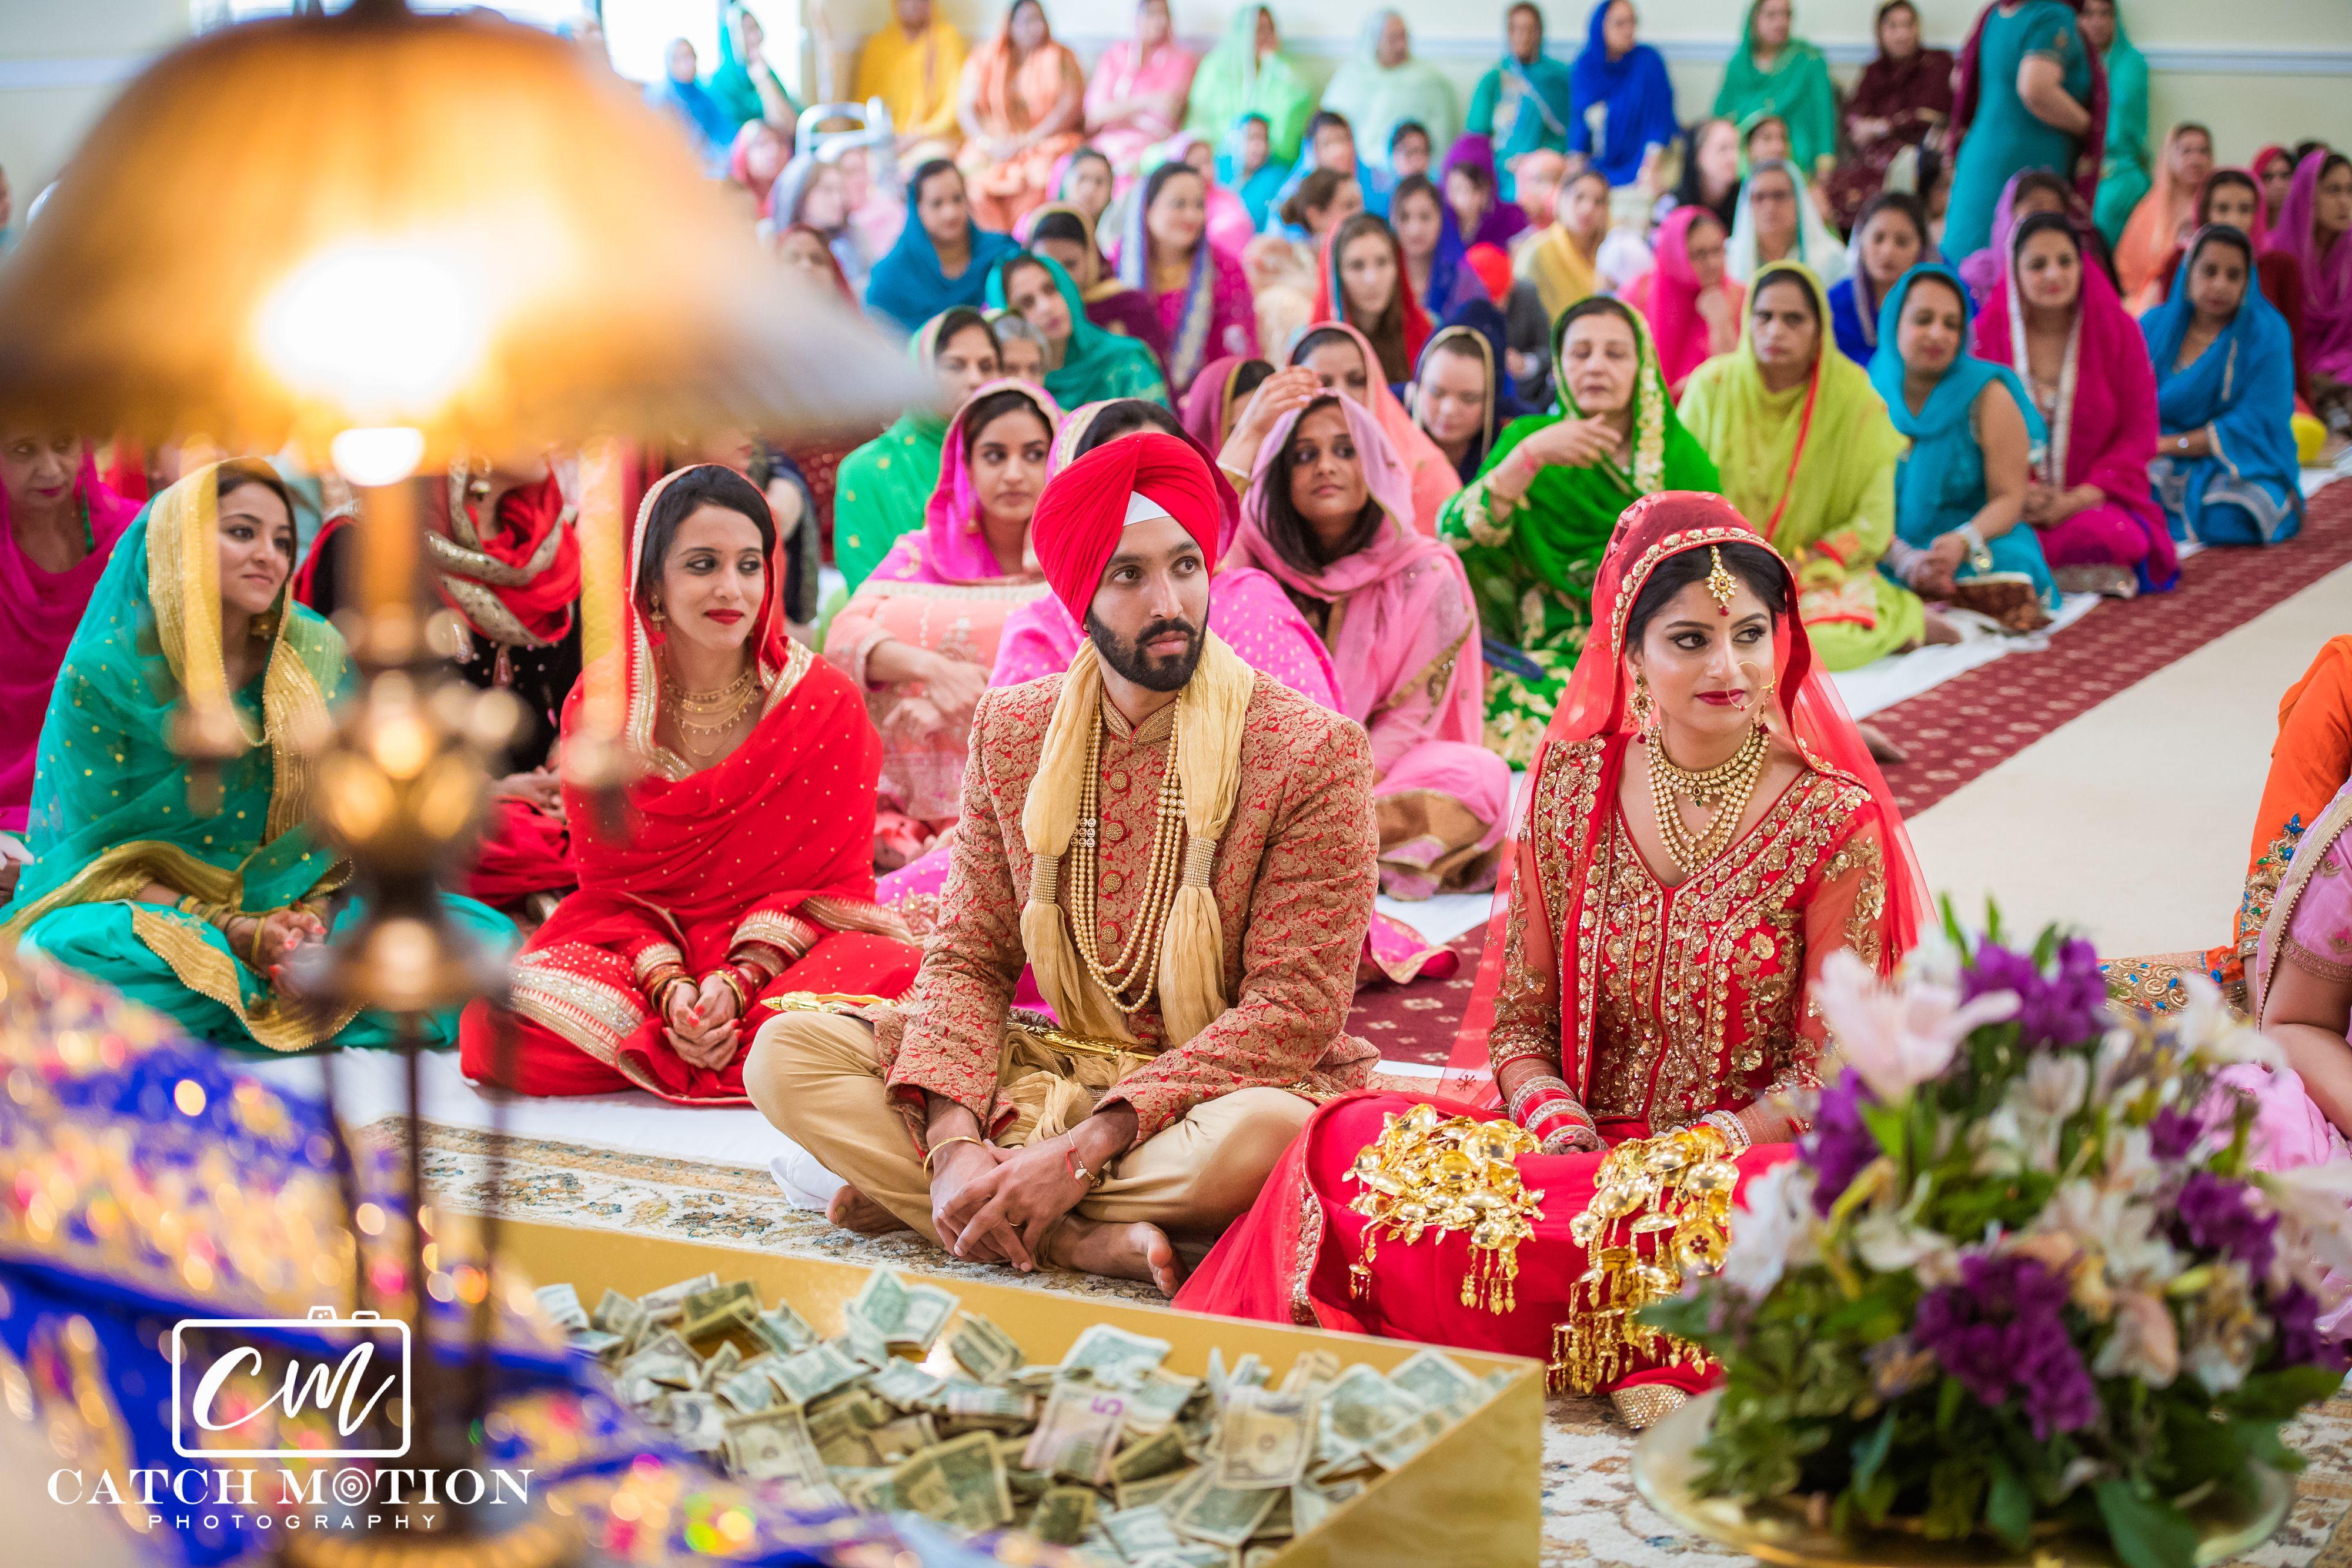 indian wedding photography design%0A Catch Motion Photography Washington DC Indian Fusion award winning wedding  photographer in Virginia  Maryland and washington DC